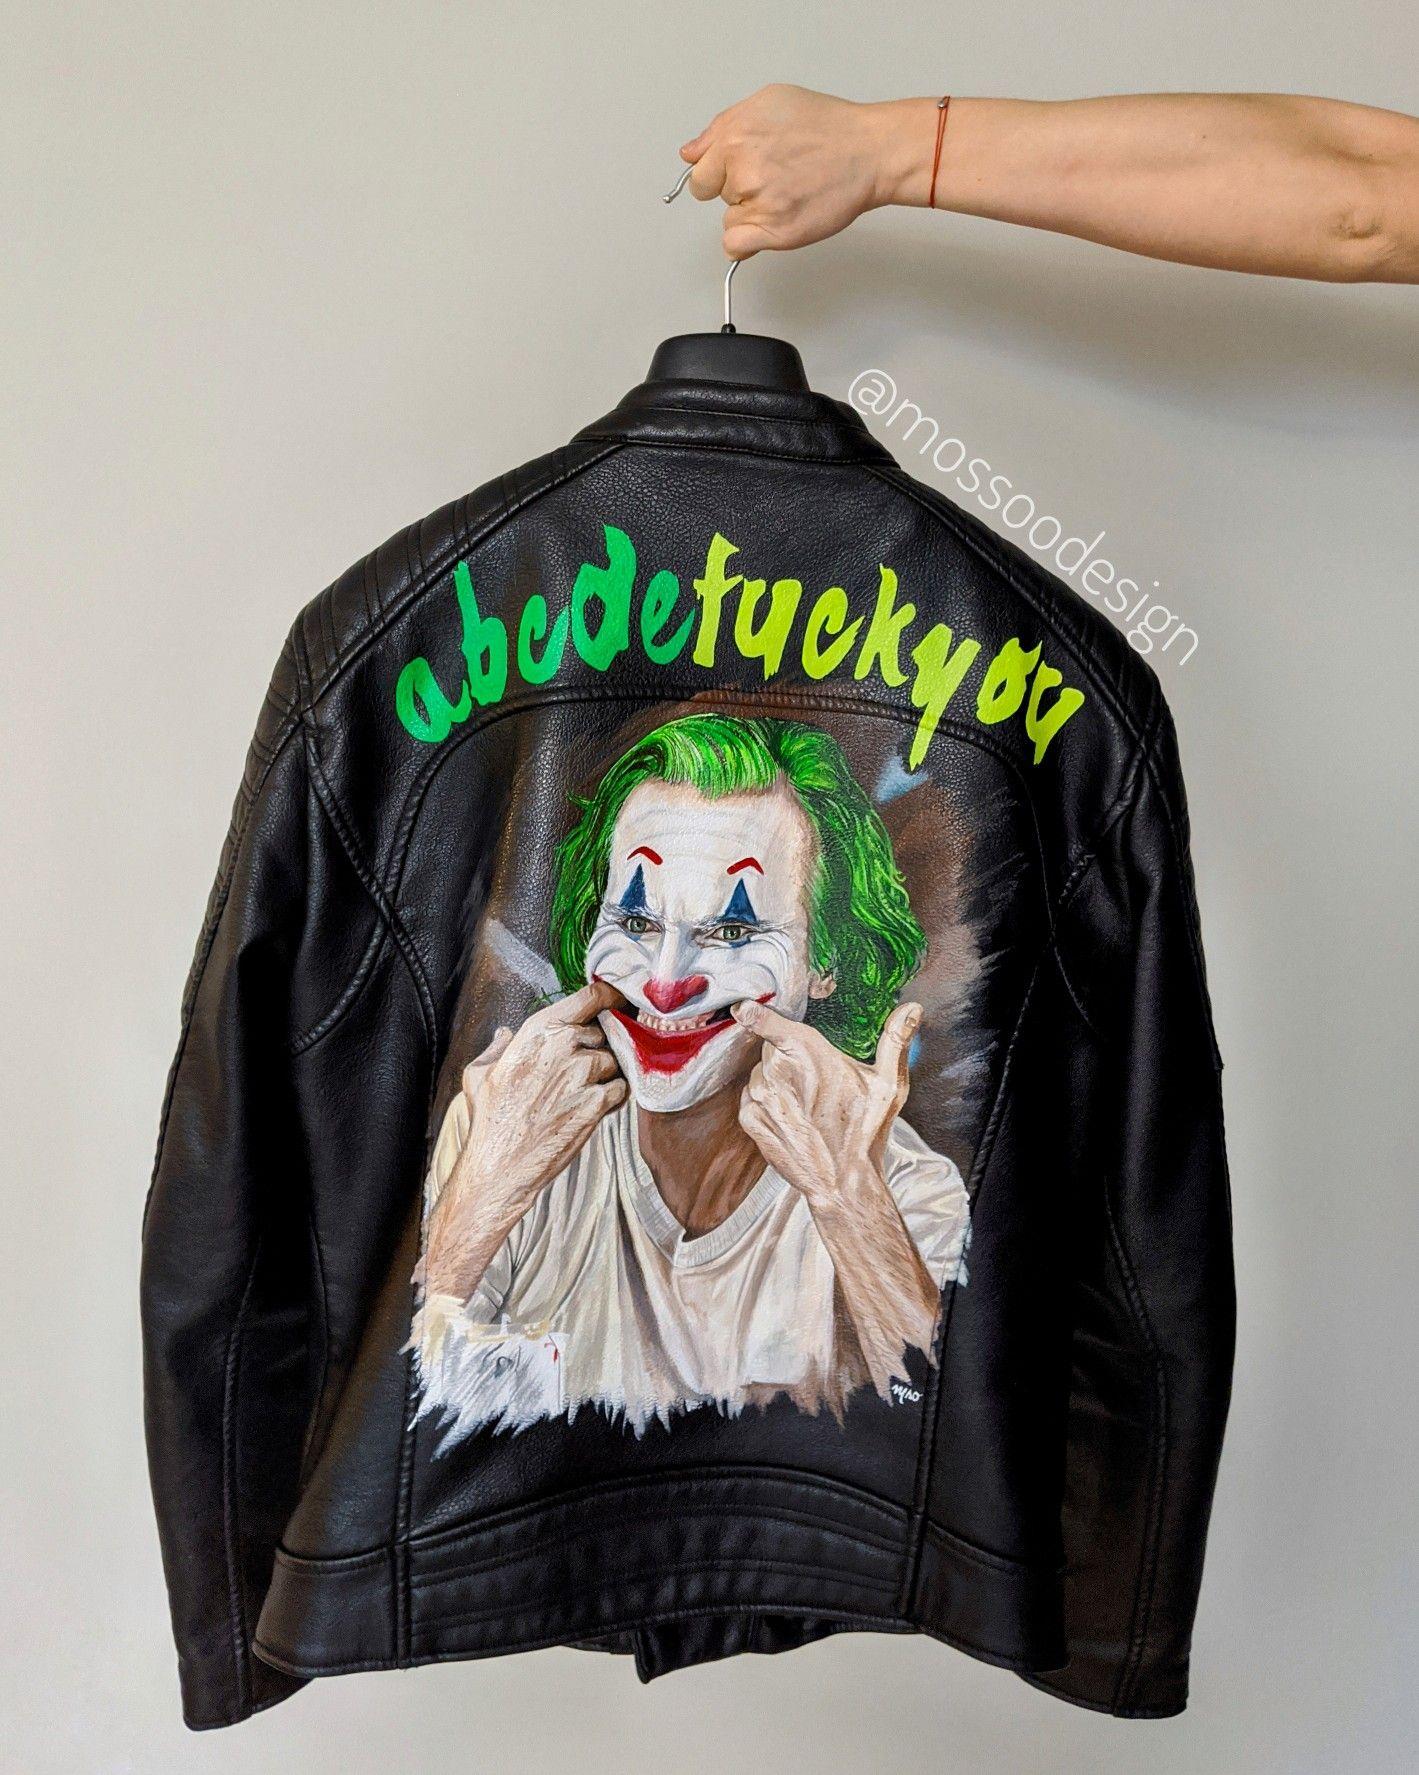 Joker Jacket By Mossoodesign Joker Jacket Painted Leather Jacket Hand Painted Leather Jacket [ 1775 x 1419 Pixel ]